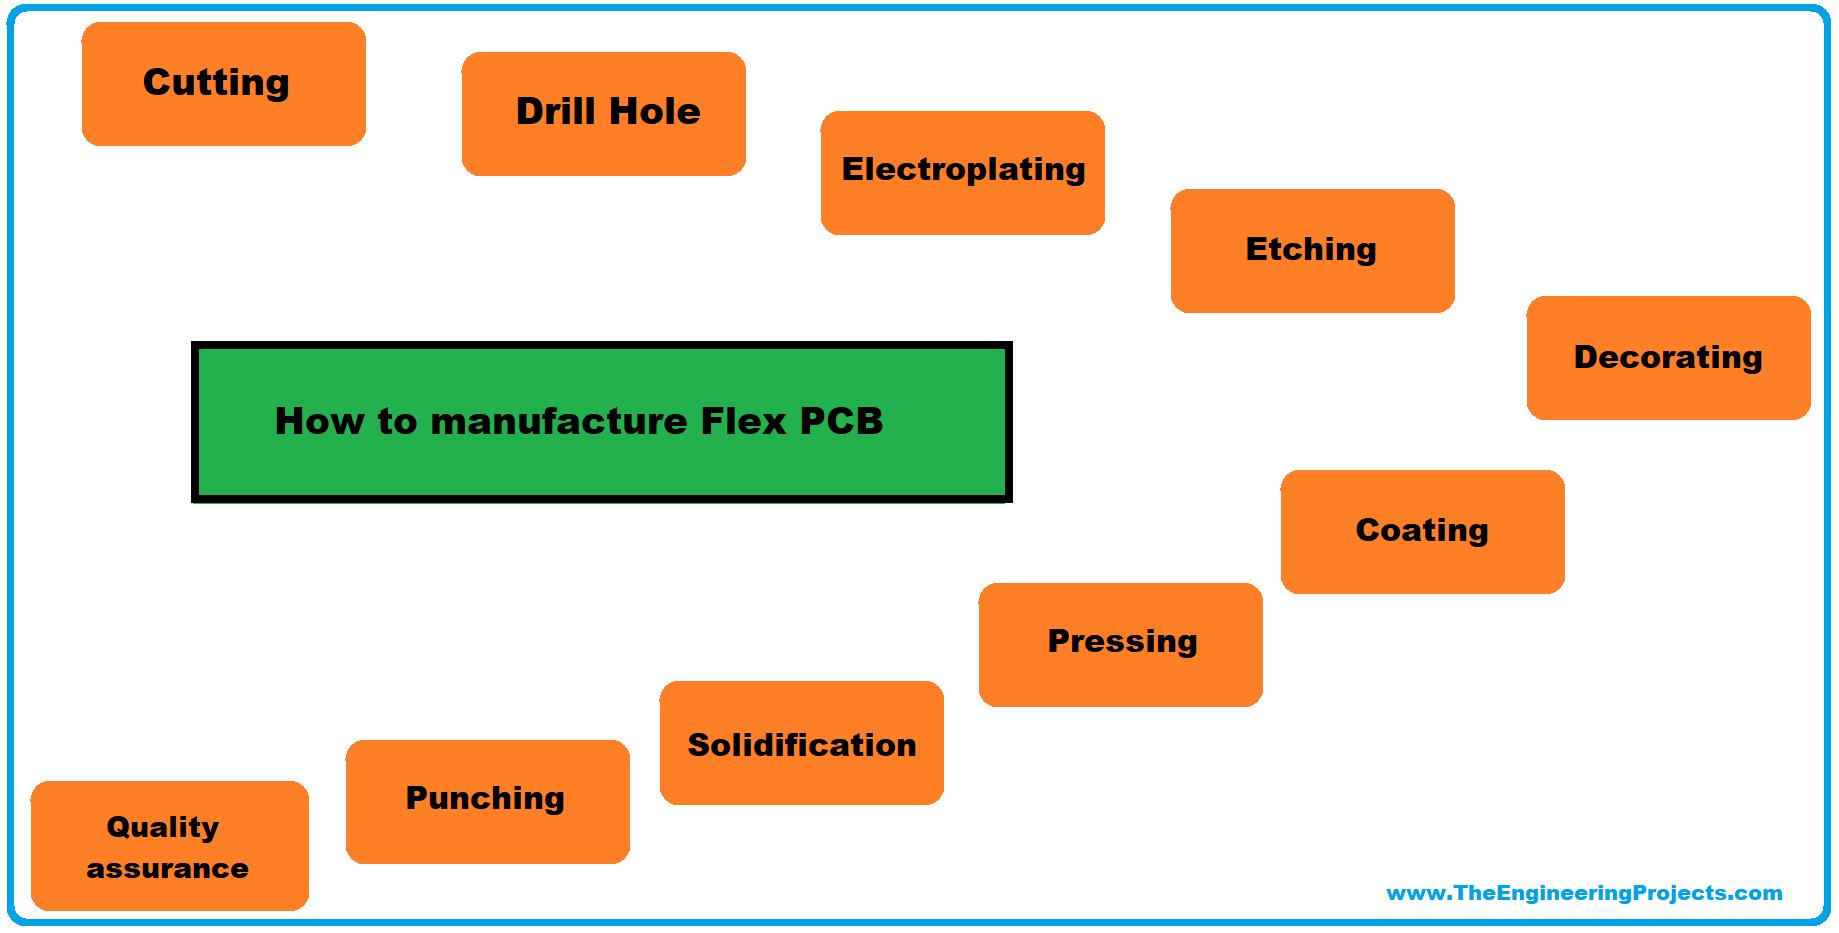 flexible pcb, flex pcb, introduction to flexible pcb, intro to flexible pcb, what is flexible pcb, what is flex pcb, applications of flexible pcb, fabrication of flexible pcb, Flexible PCB Manufacturing Process